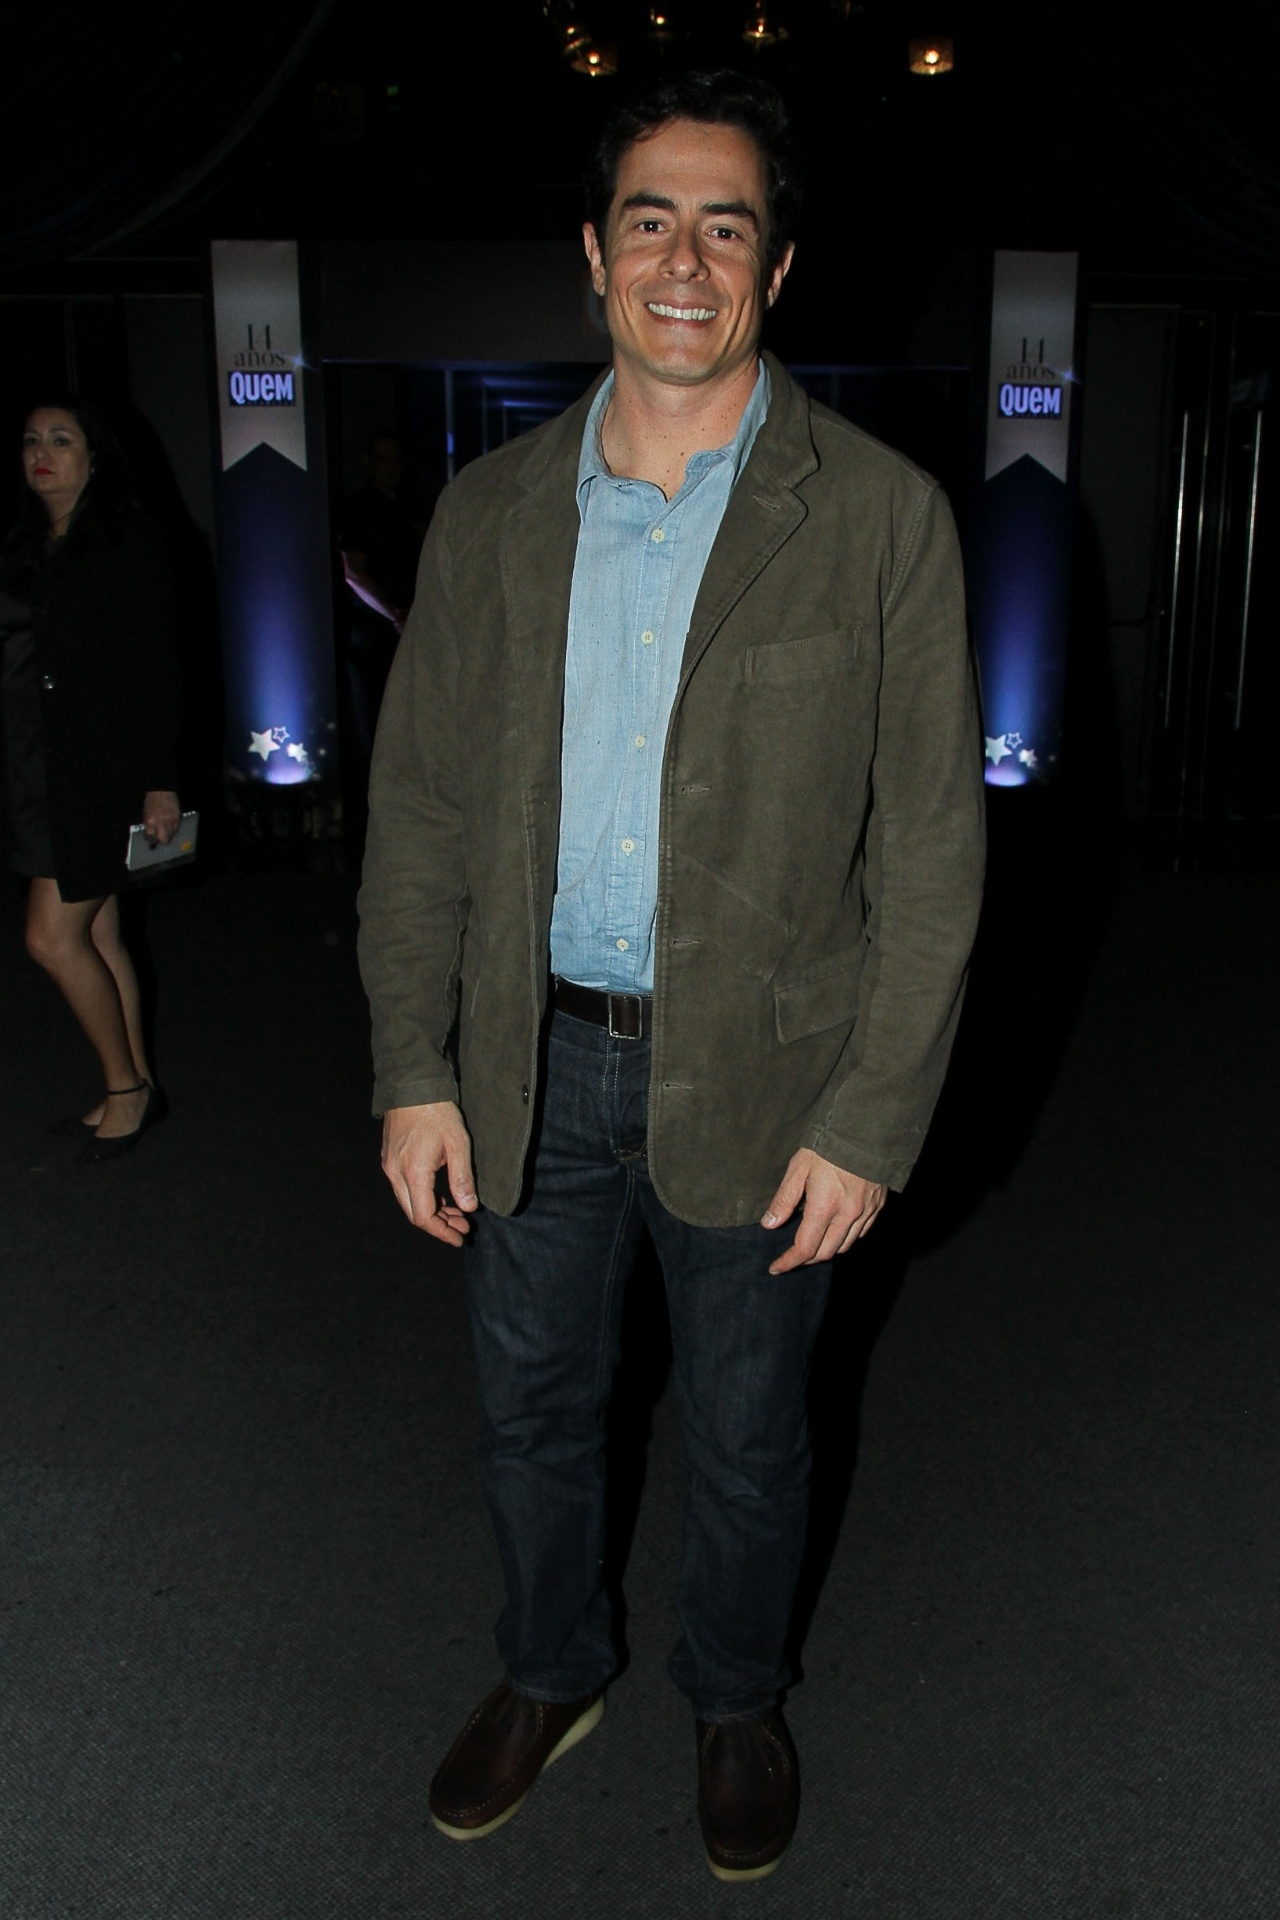 7.out.2014 - O ator Felipe Folgosi mostra seu estilo na festa de 14 anos da revista